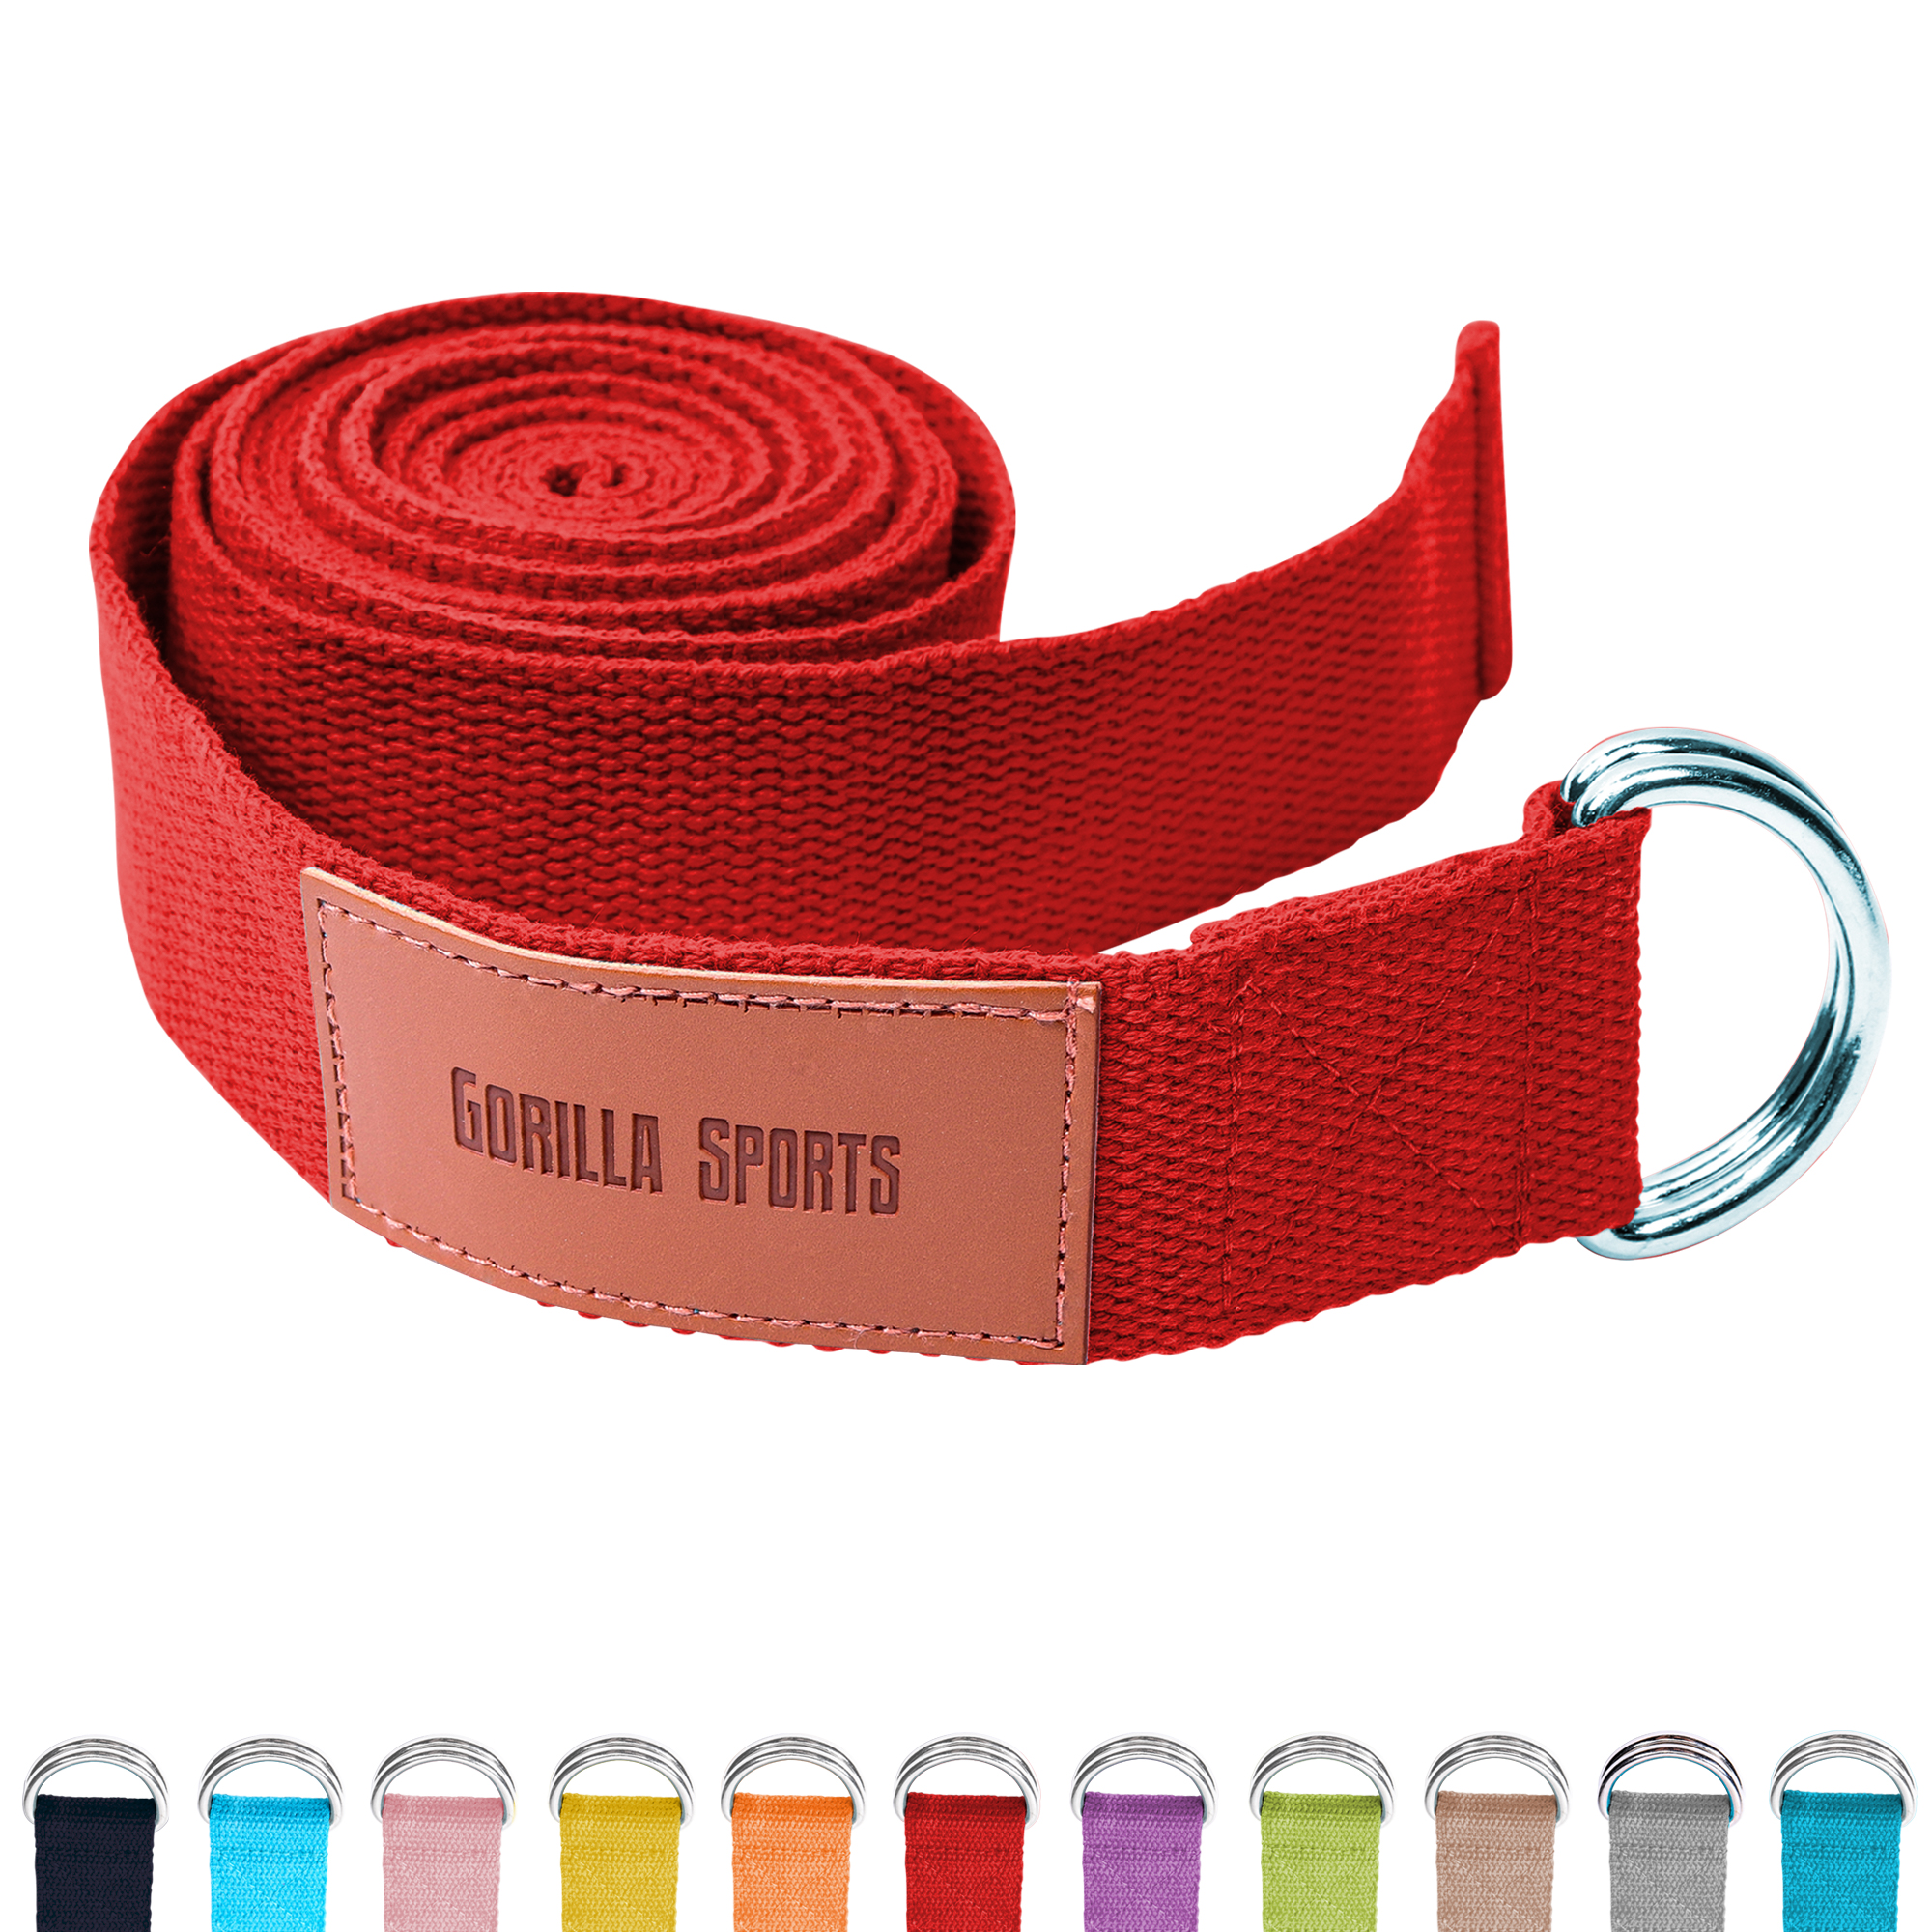 Gorilla Sports Yogagurt Rot 260 x 3,8 cm 101048-00038-0219